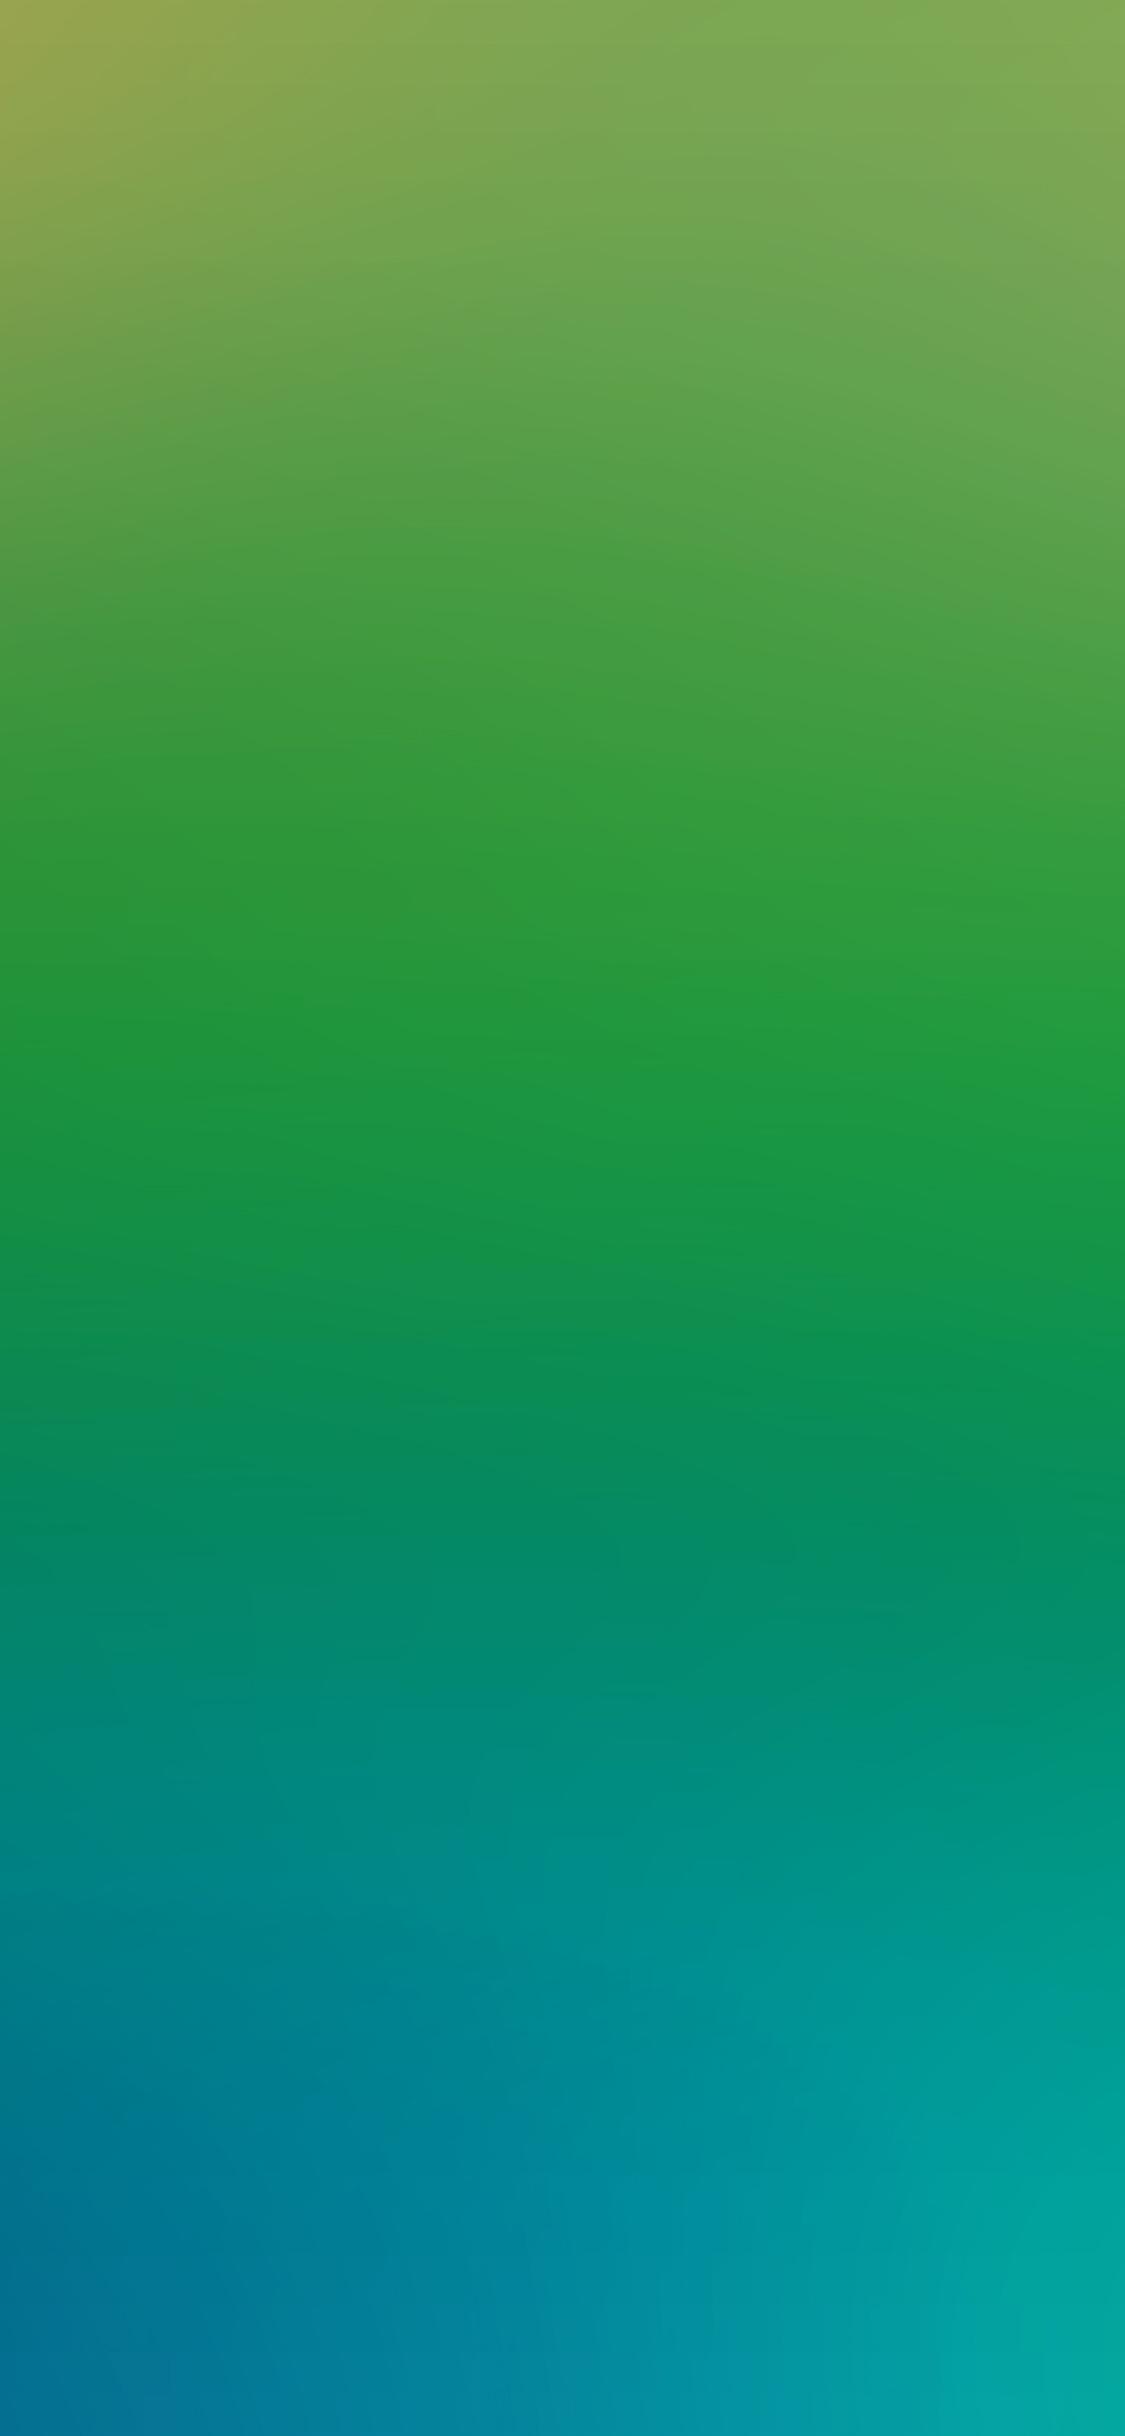 iPhoneXpapers.com-Apple-iPhone-wallpaper-sl09-soft-blue-green-wood-blur-gradation